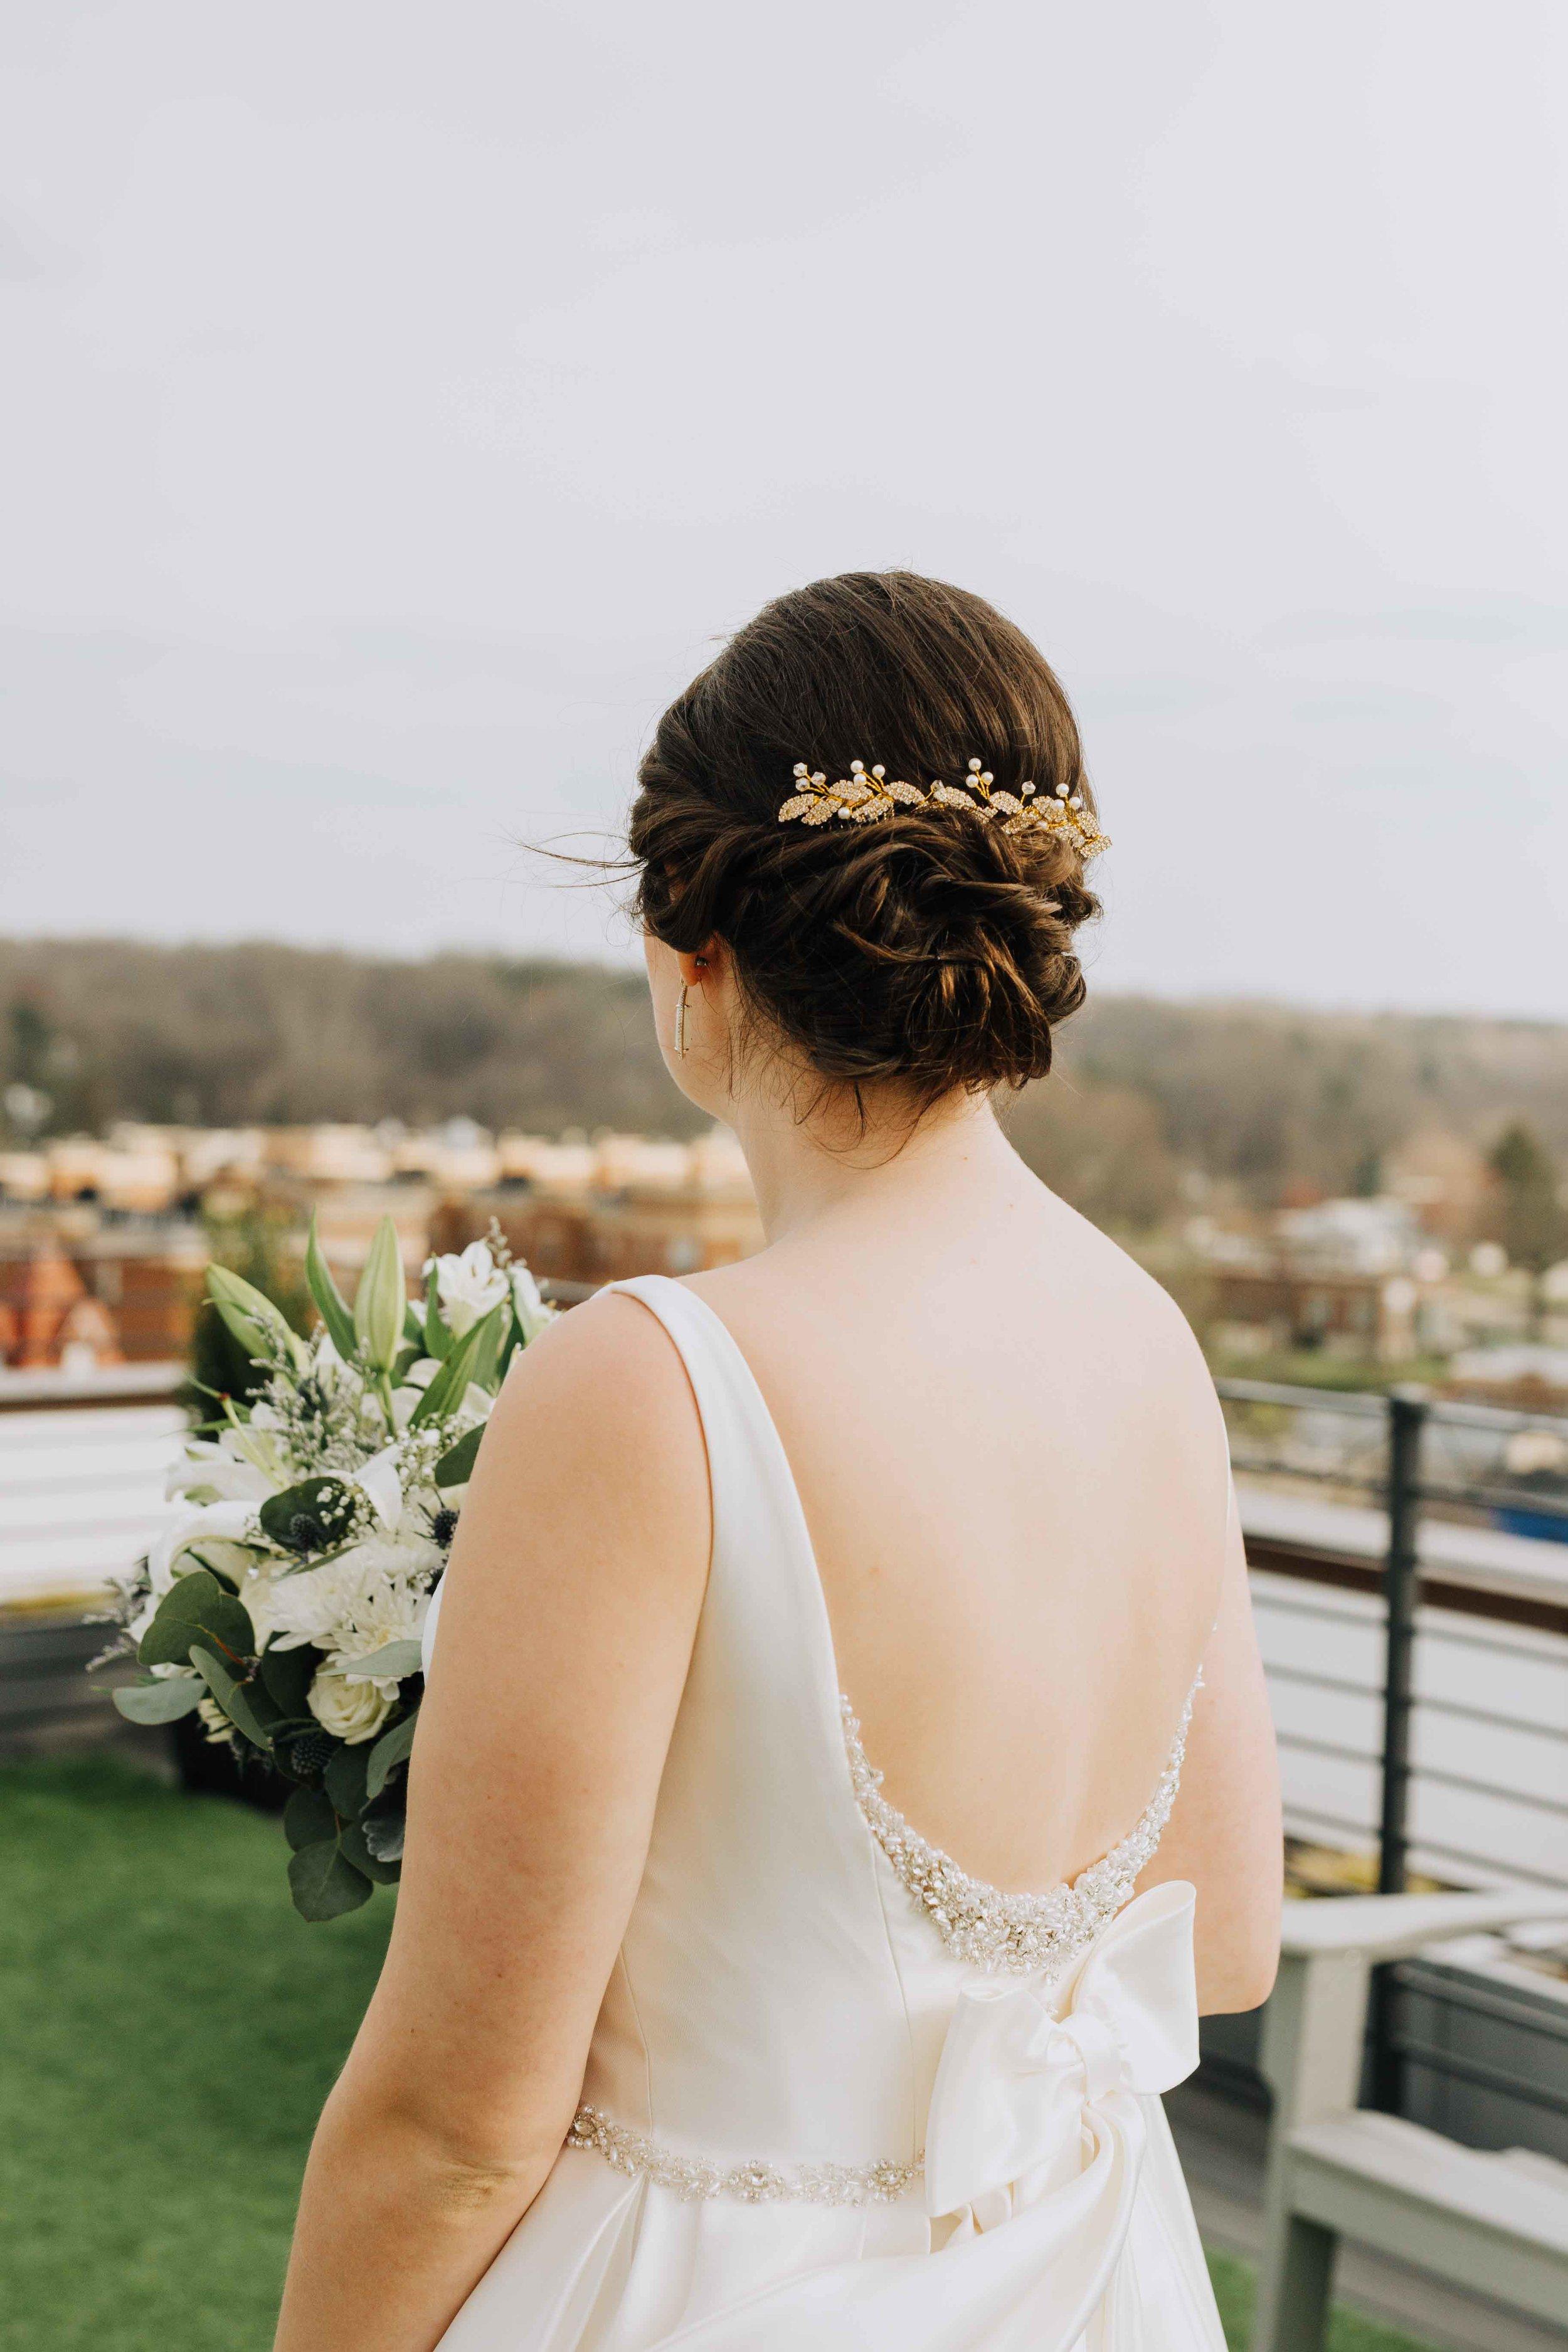 Farmville-Virginia-Wedding-Hotel-Weynoke-Downtown-Jacqueline-Waters-Photography-Detailed- (631).jpg